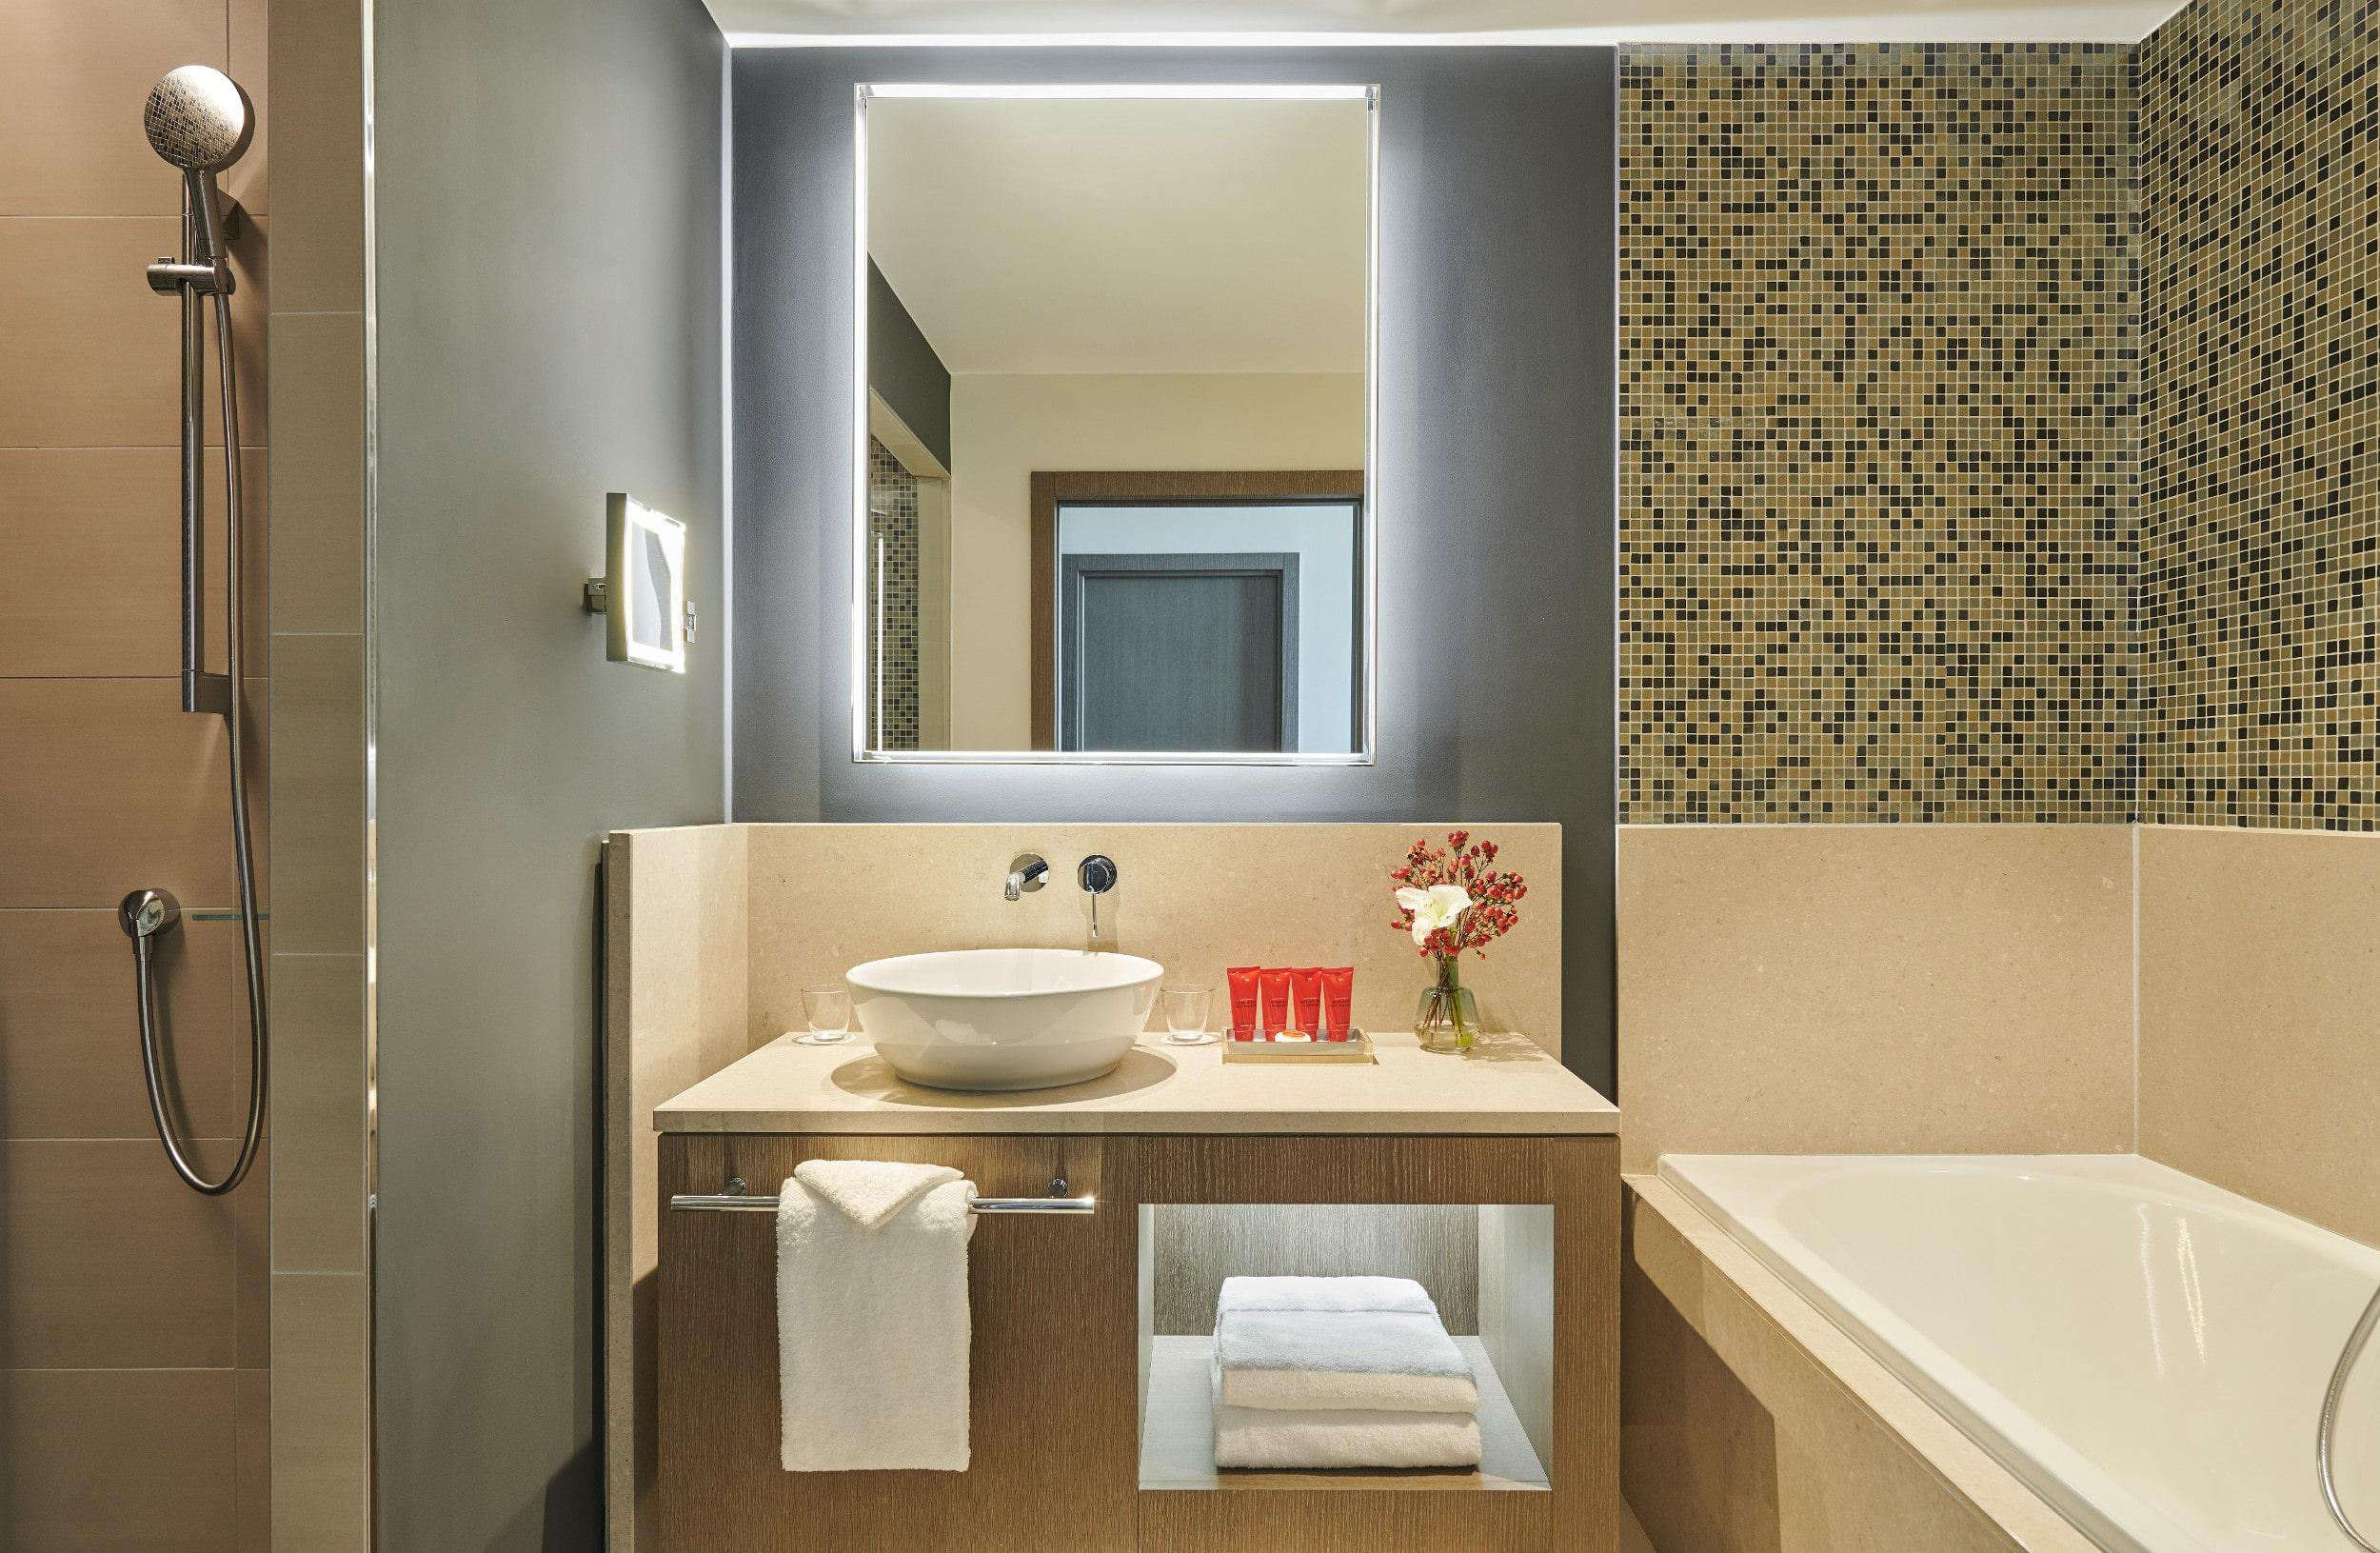 InterContinental Lyon - Hotel Dieu - salle de bains - Chambre Executive - Vue Rhone - MICE - Travel